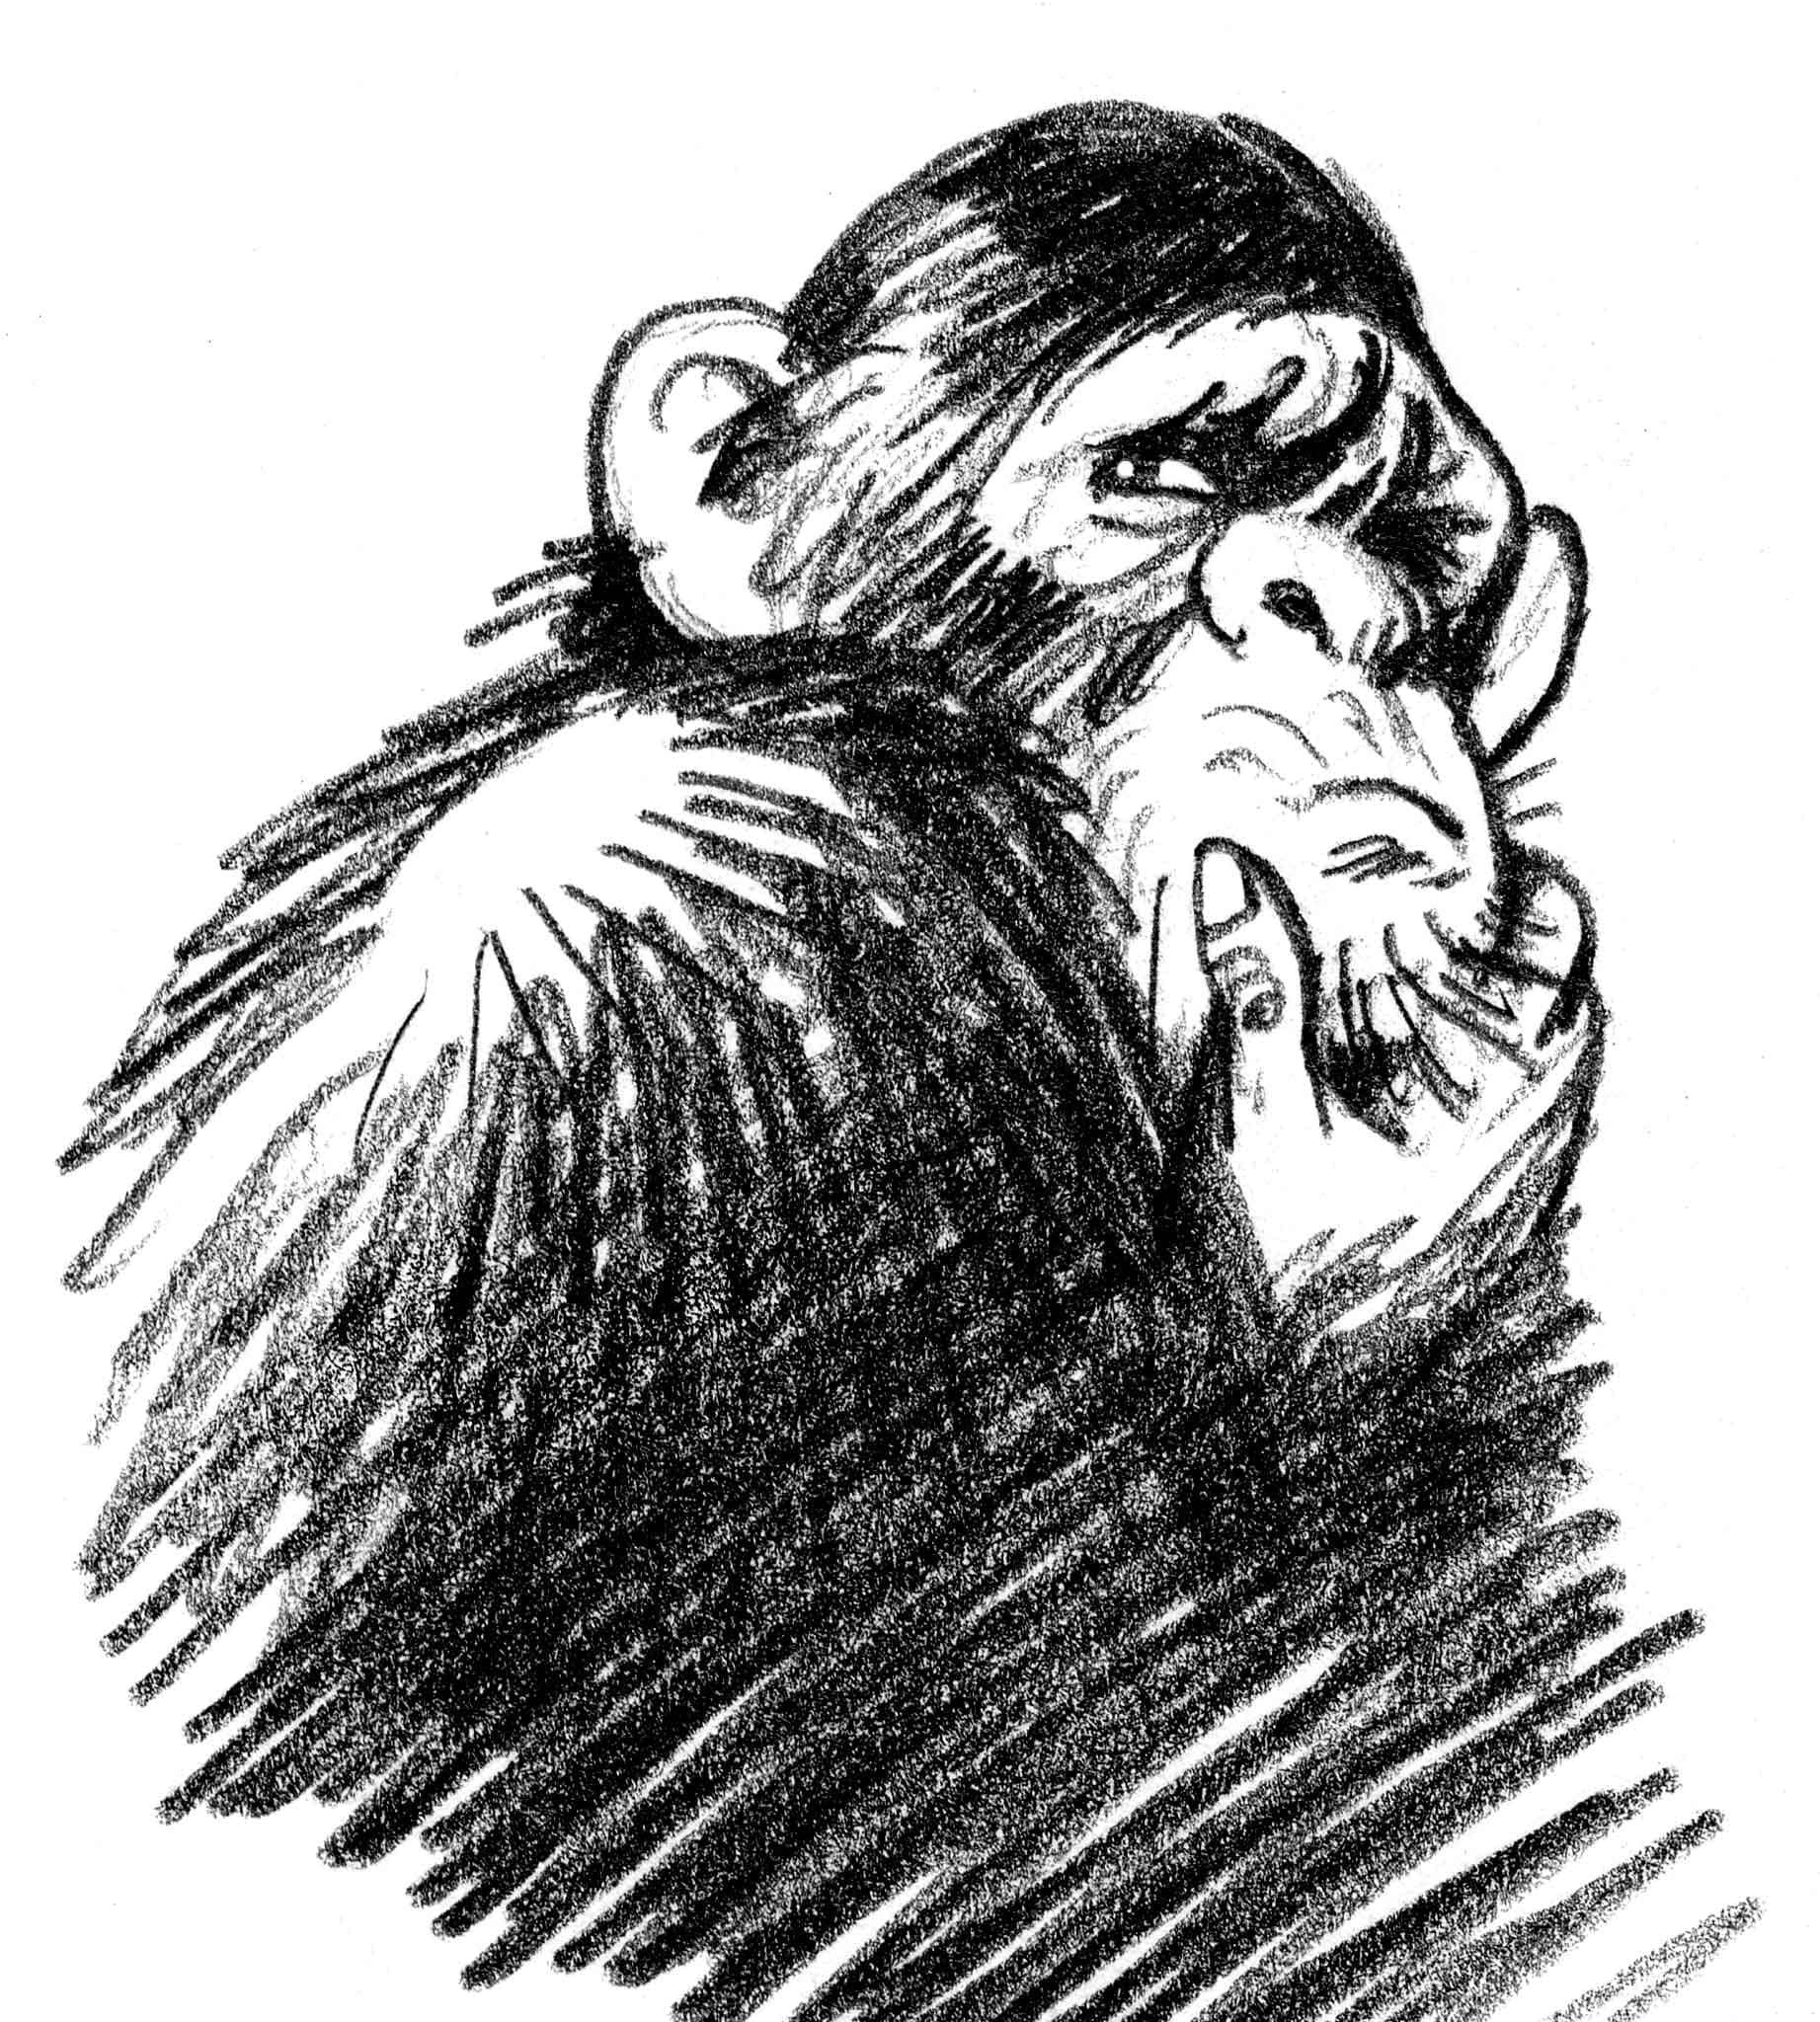 KH2900N-battle-monkeys-pensive-chimp